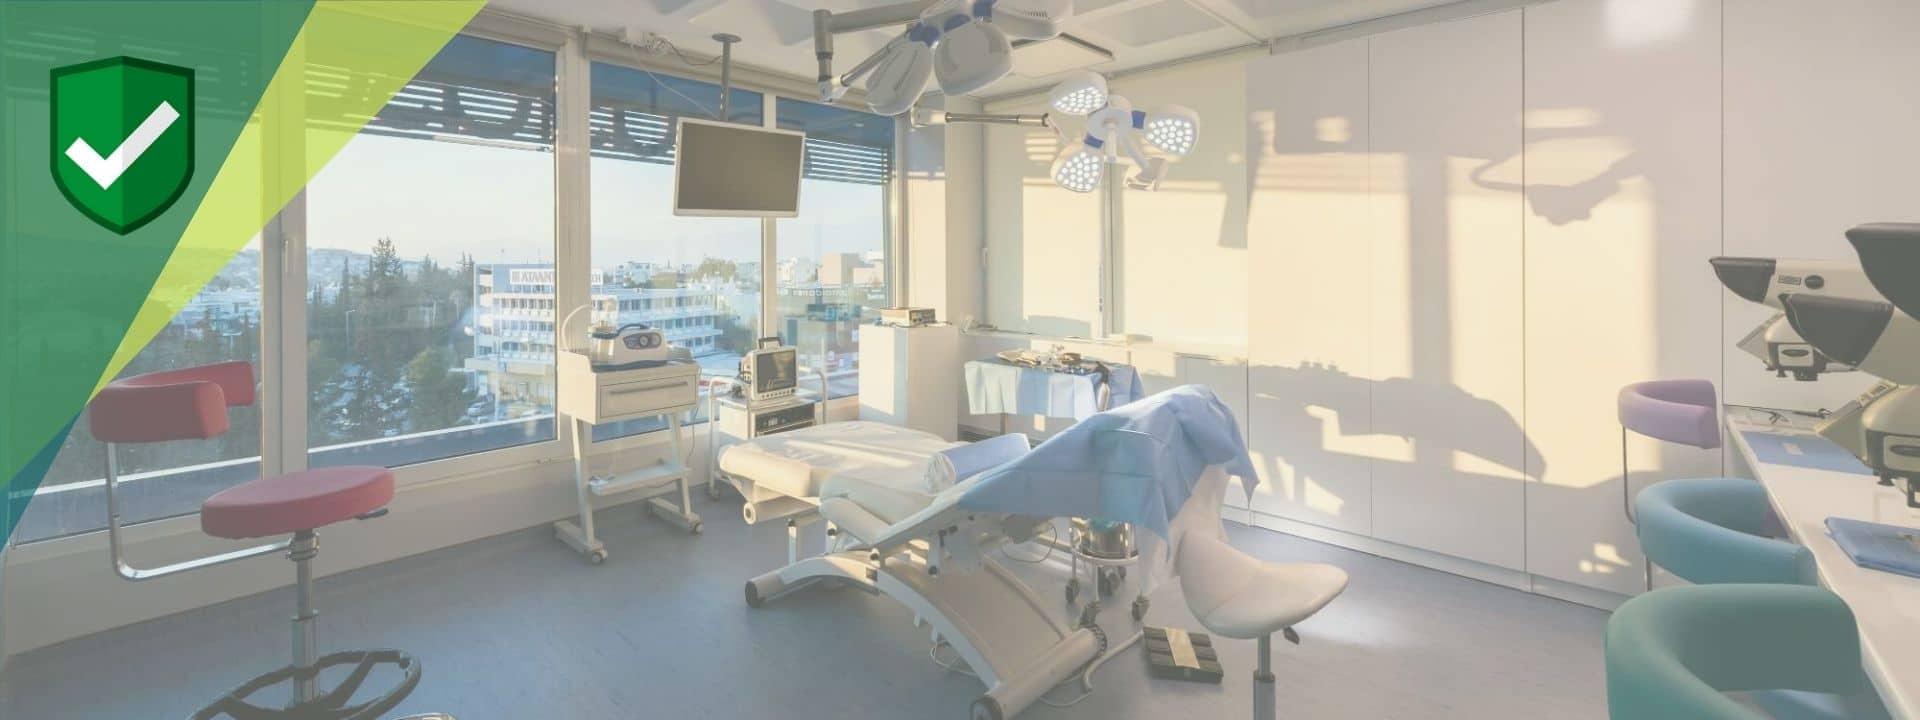 asfalis-metamosxefsi-mallion-anastasakis-hair-clinic